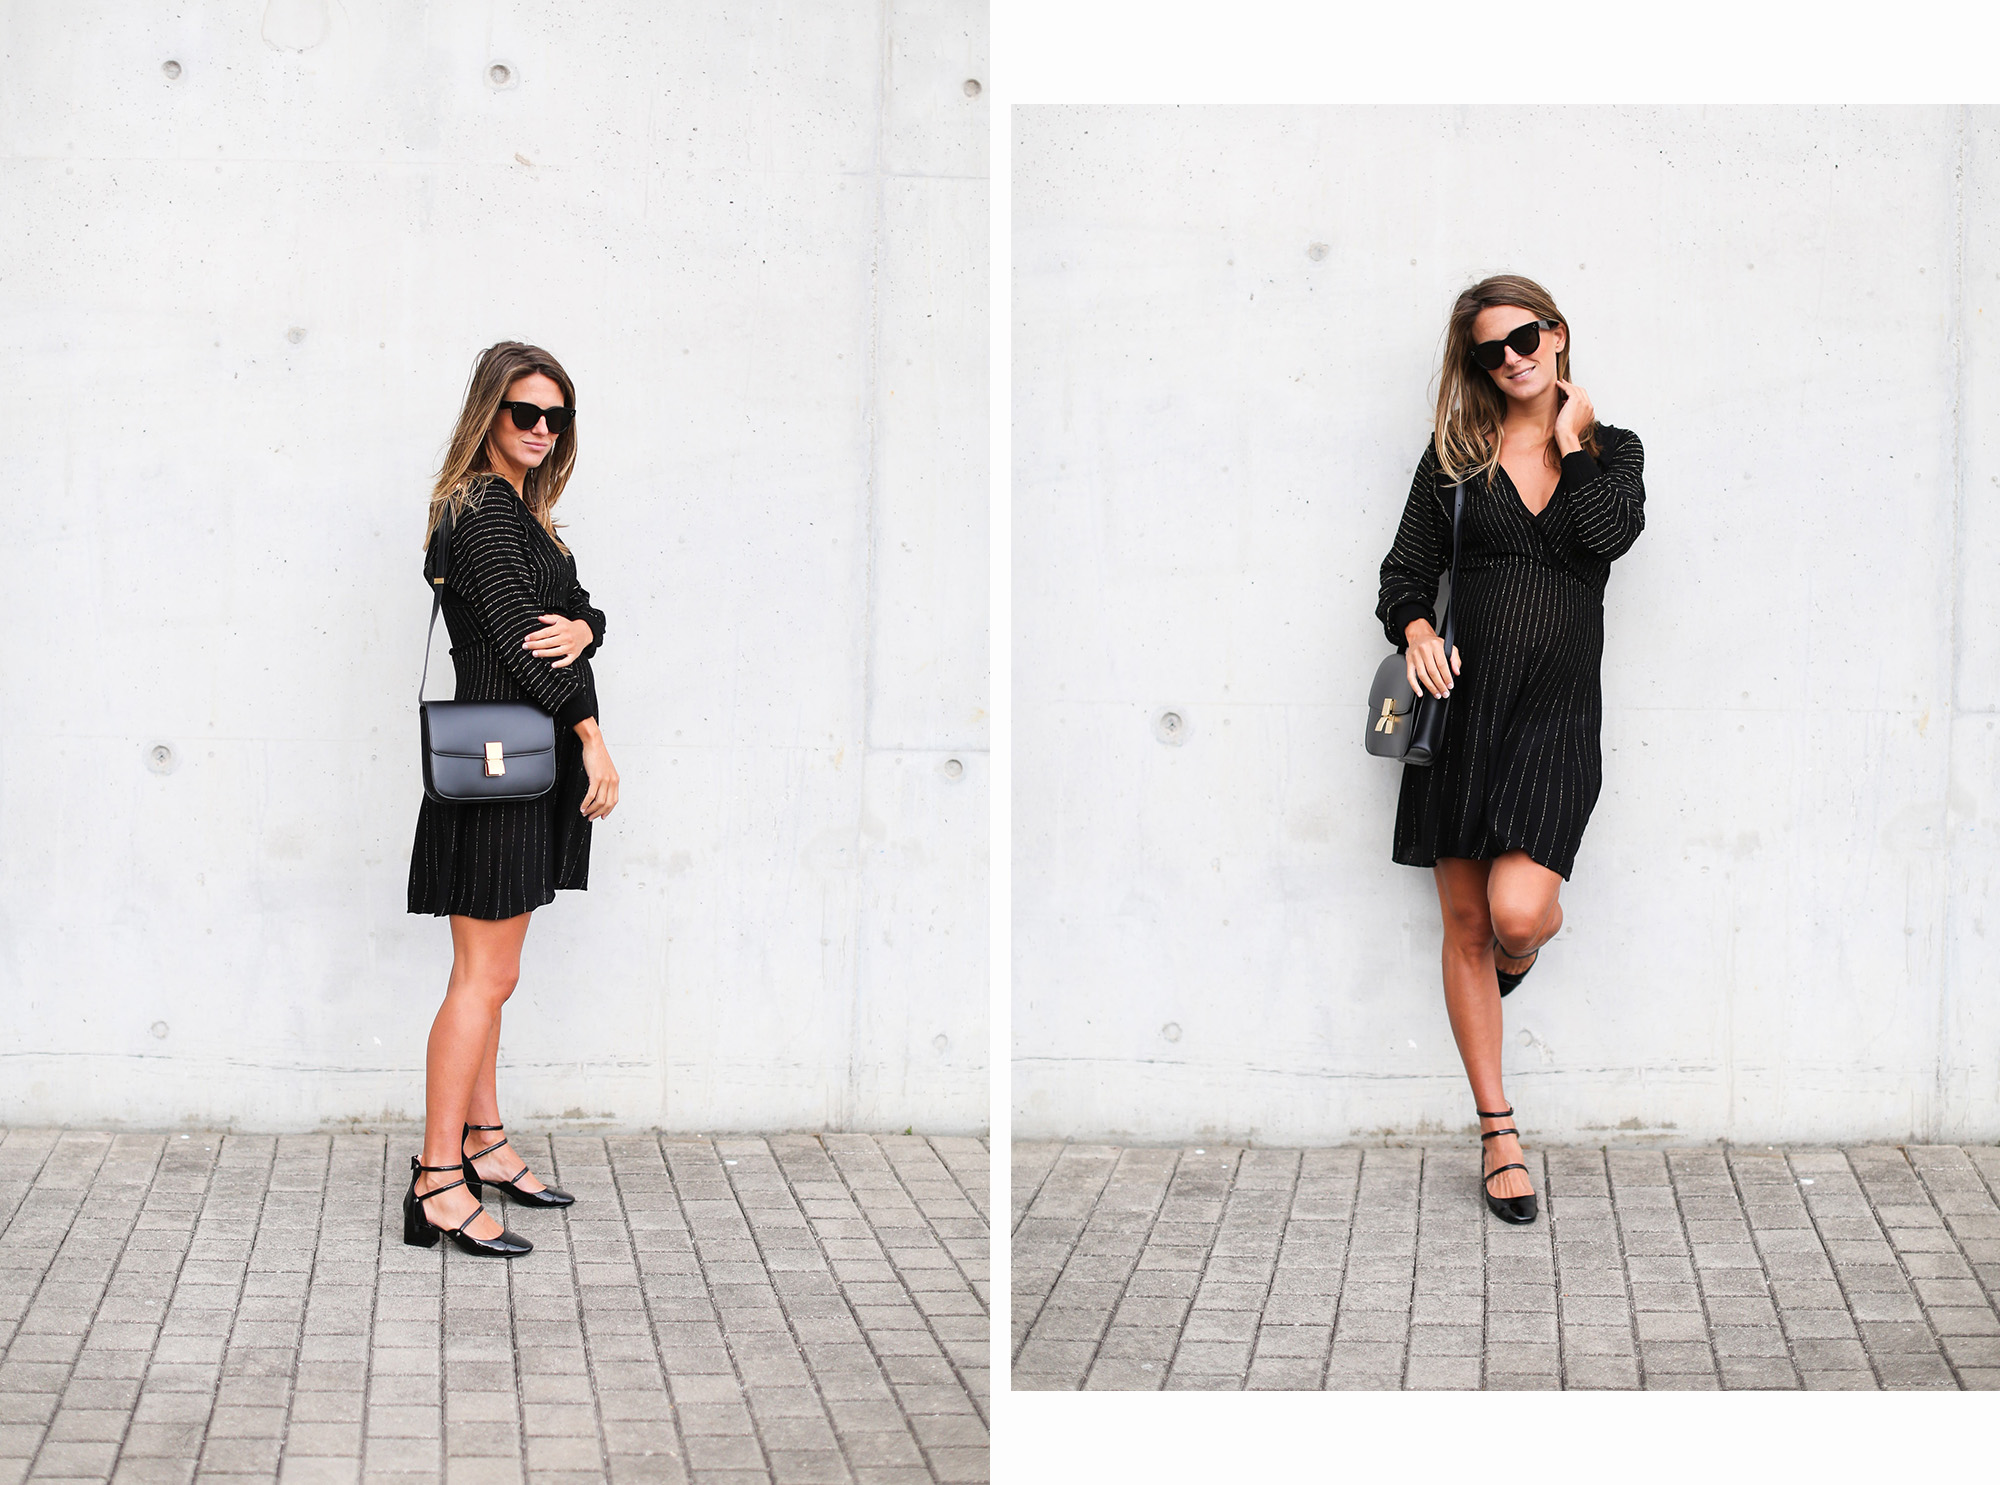 Clochet_streetstyle_fashionblogger_zaraknitdress_specialedition_celineboxbag_celinesunglasses-12